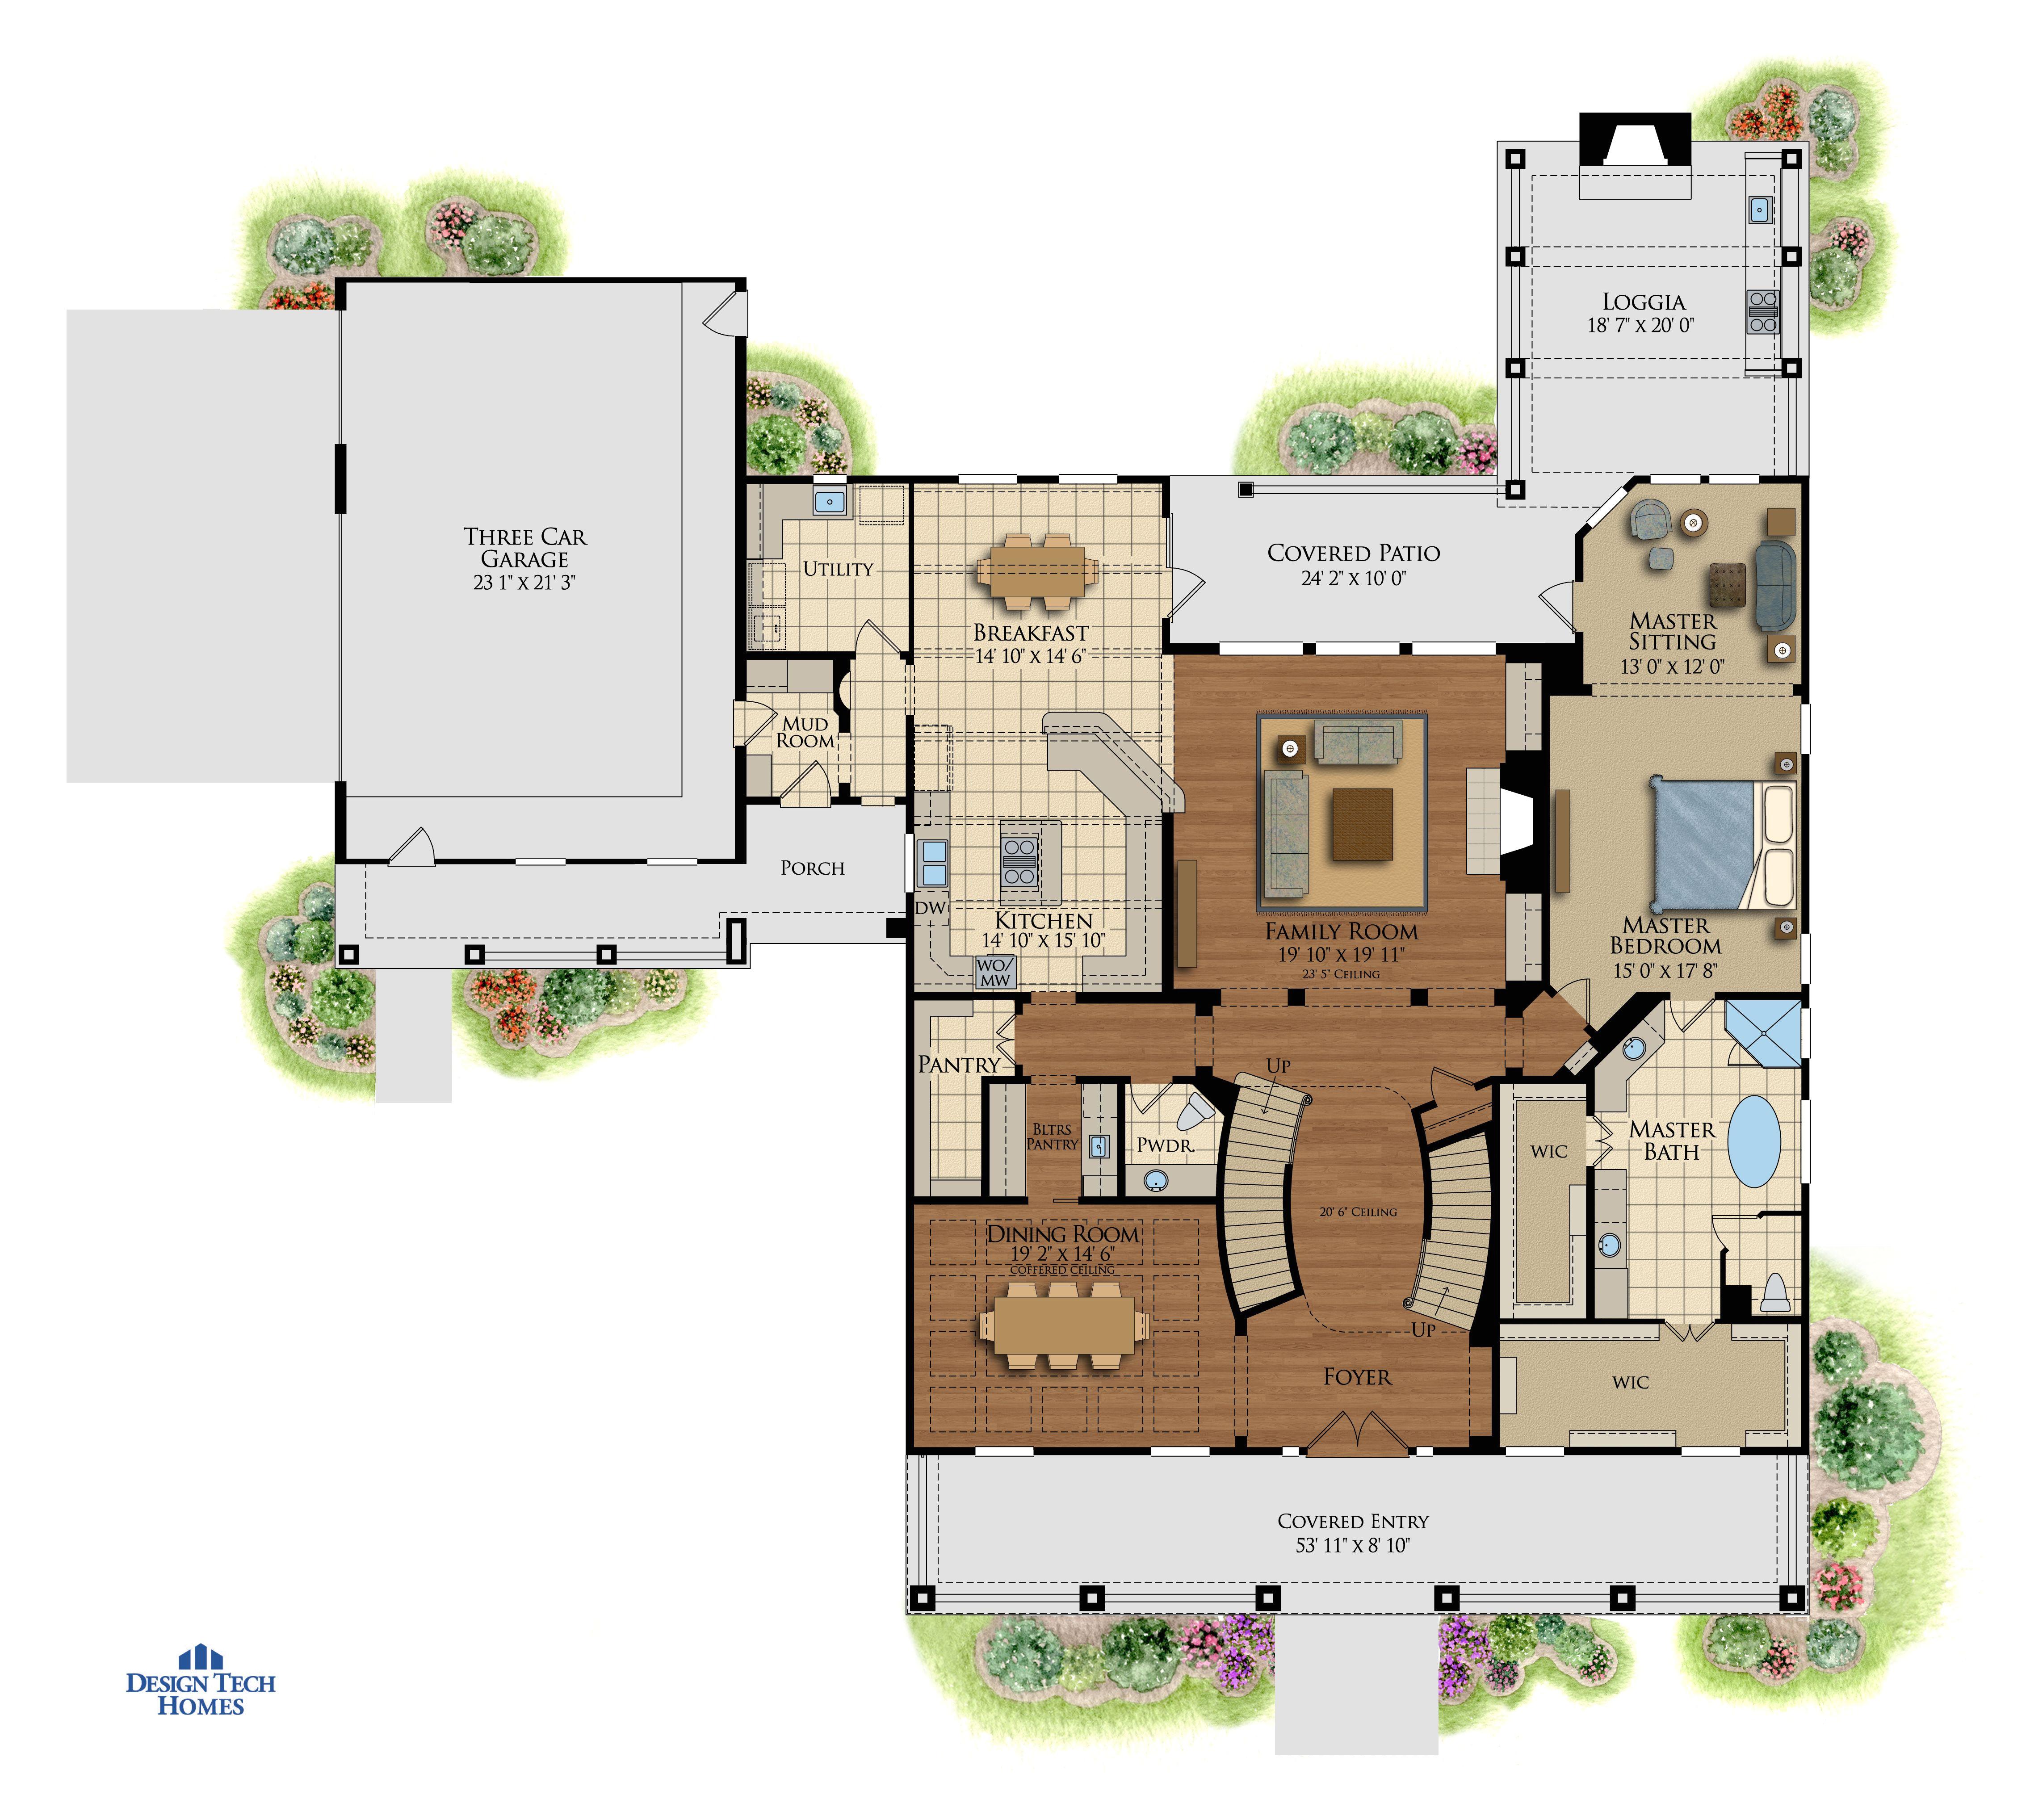 design tech home floor plans